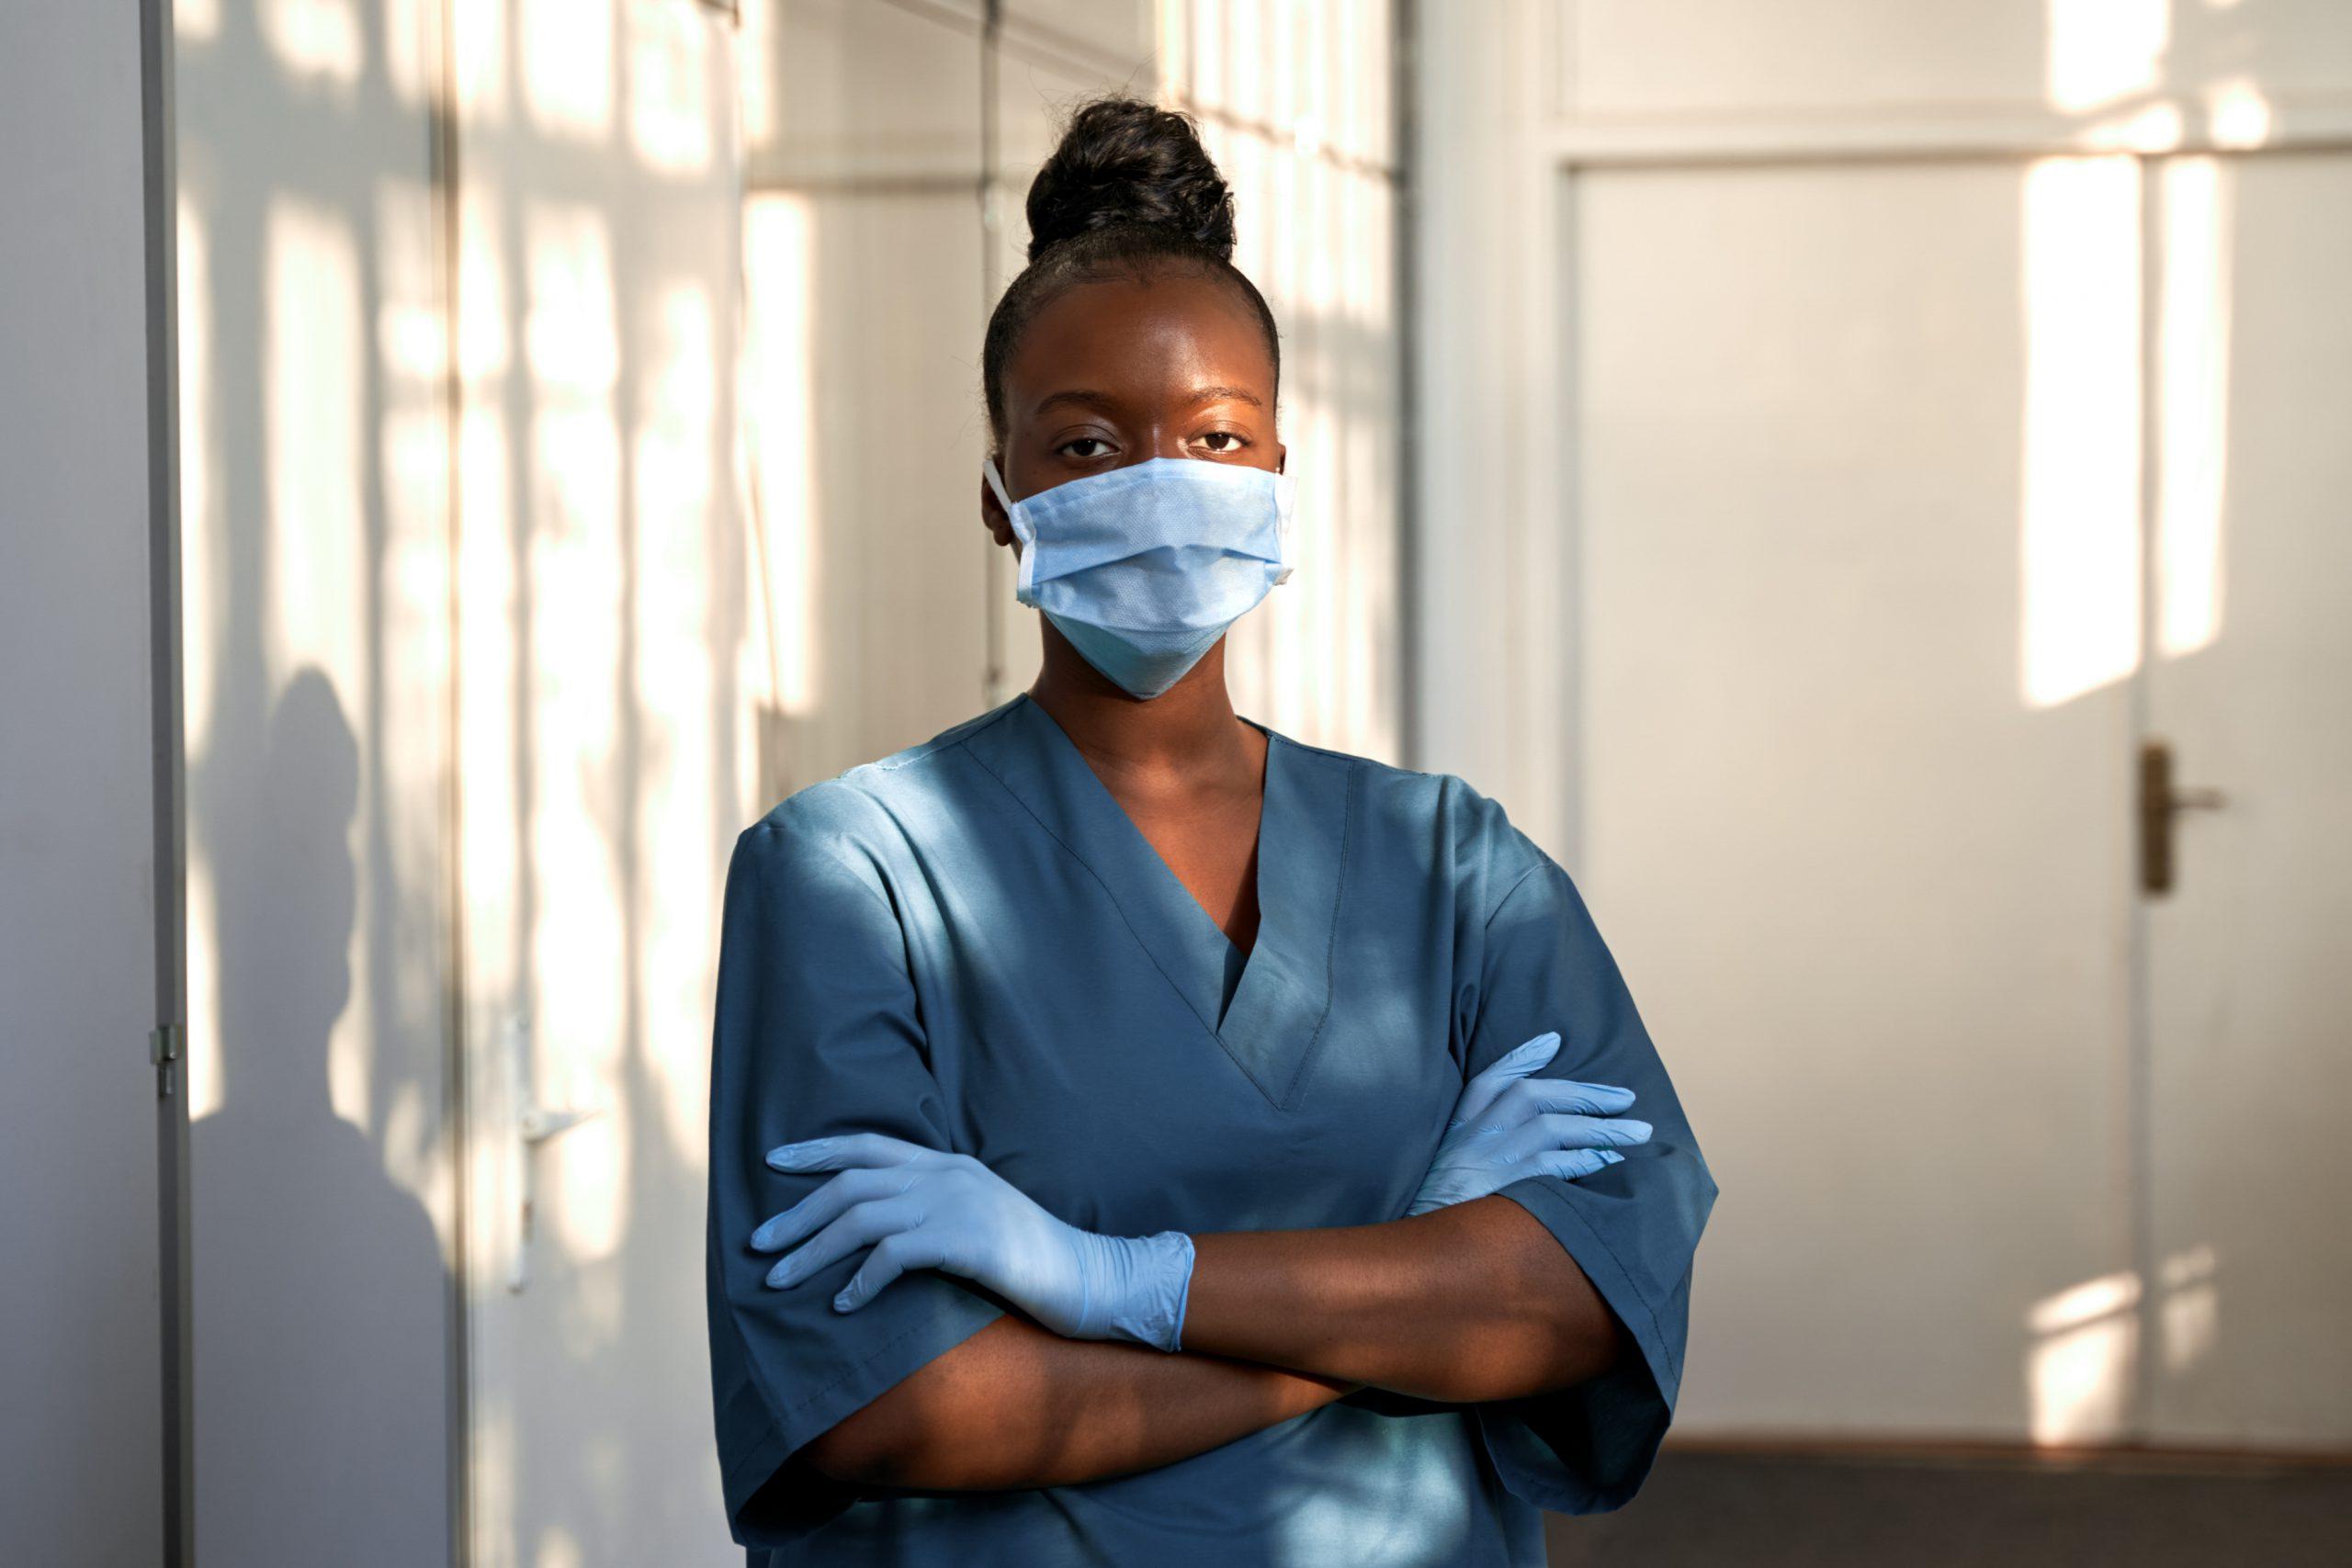 Confident african nurse wear blue uniform, face mask, standing in hospital.